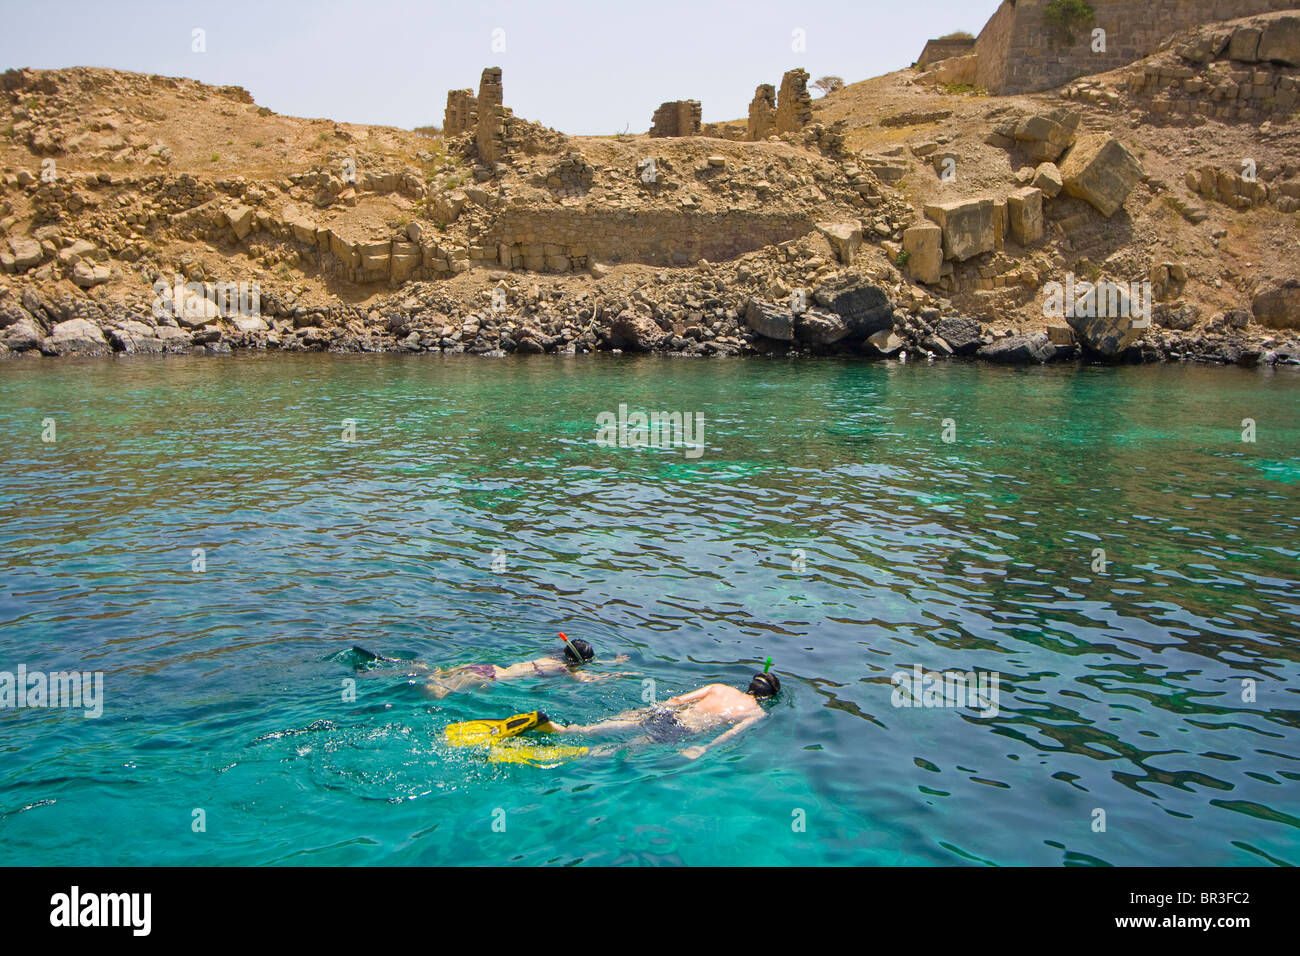 Tourist Couple Snorkeling à Telegraph Island sur le Khrofakkan Pensinsula en Oman Photo Stock